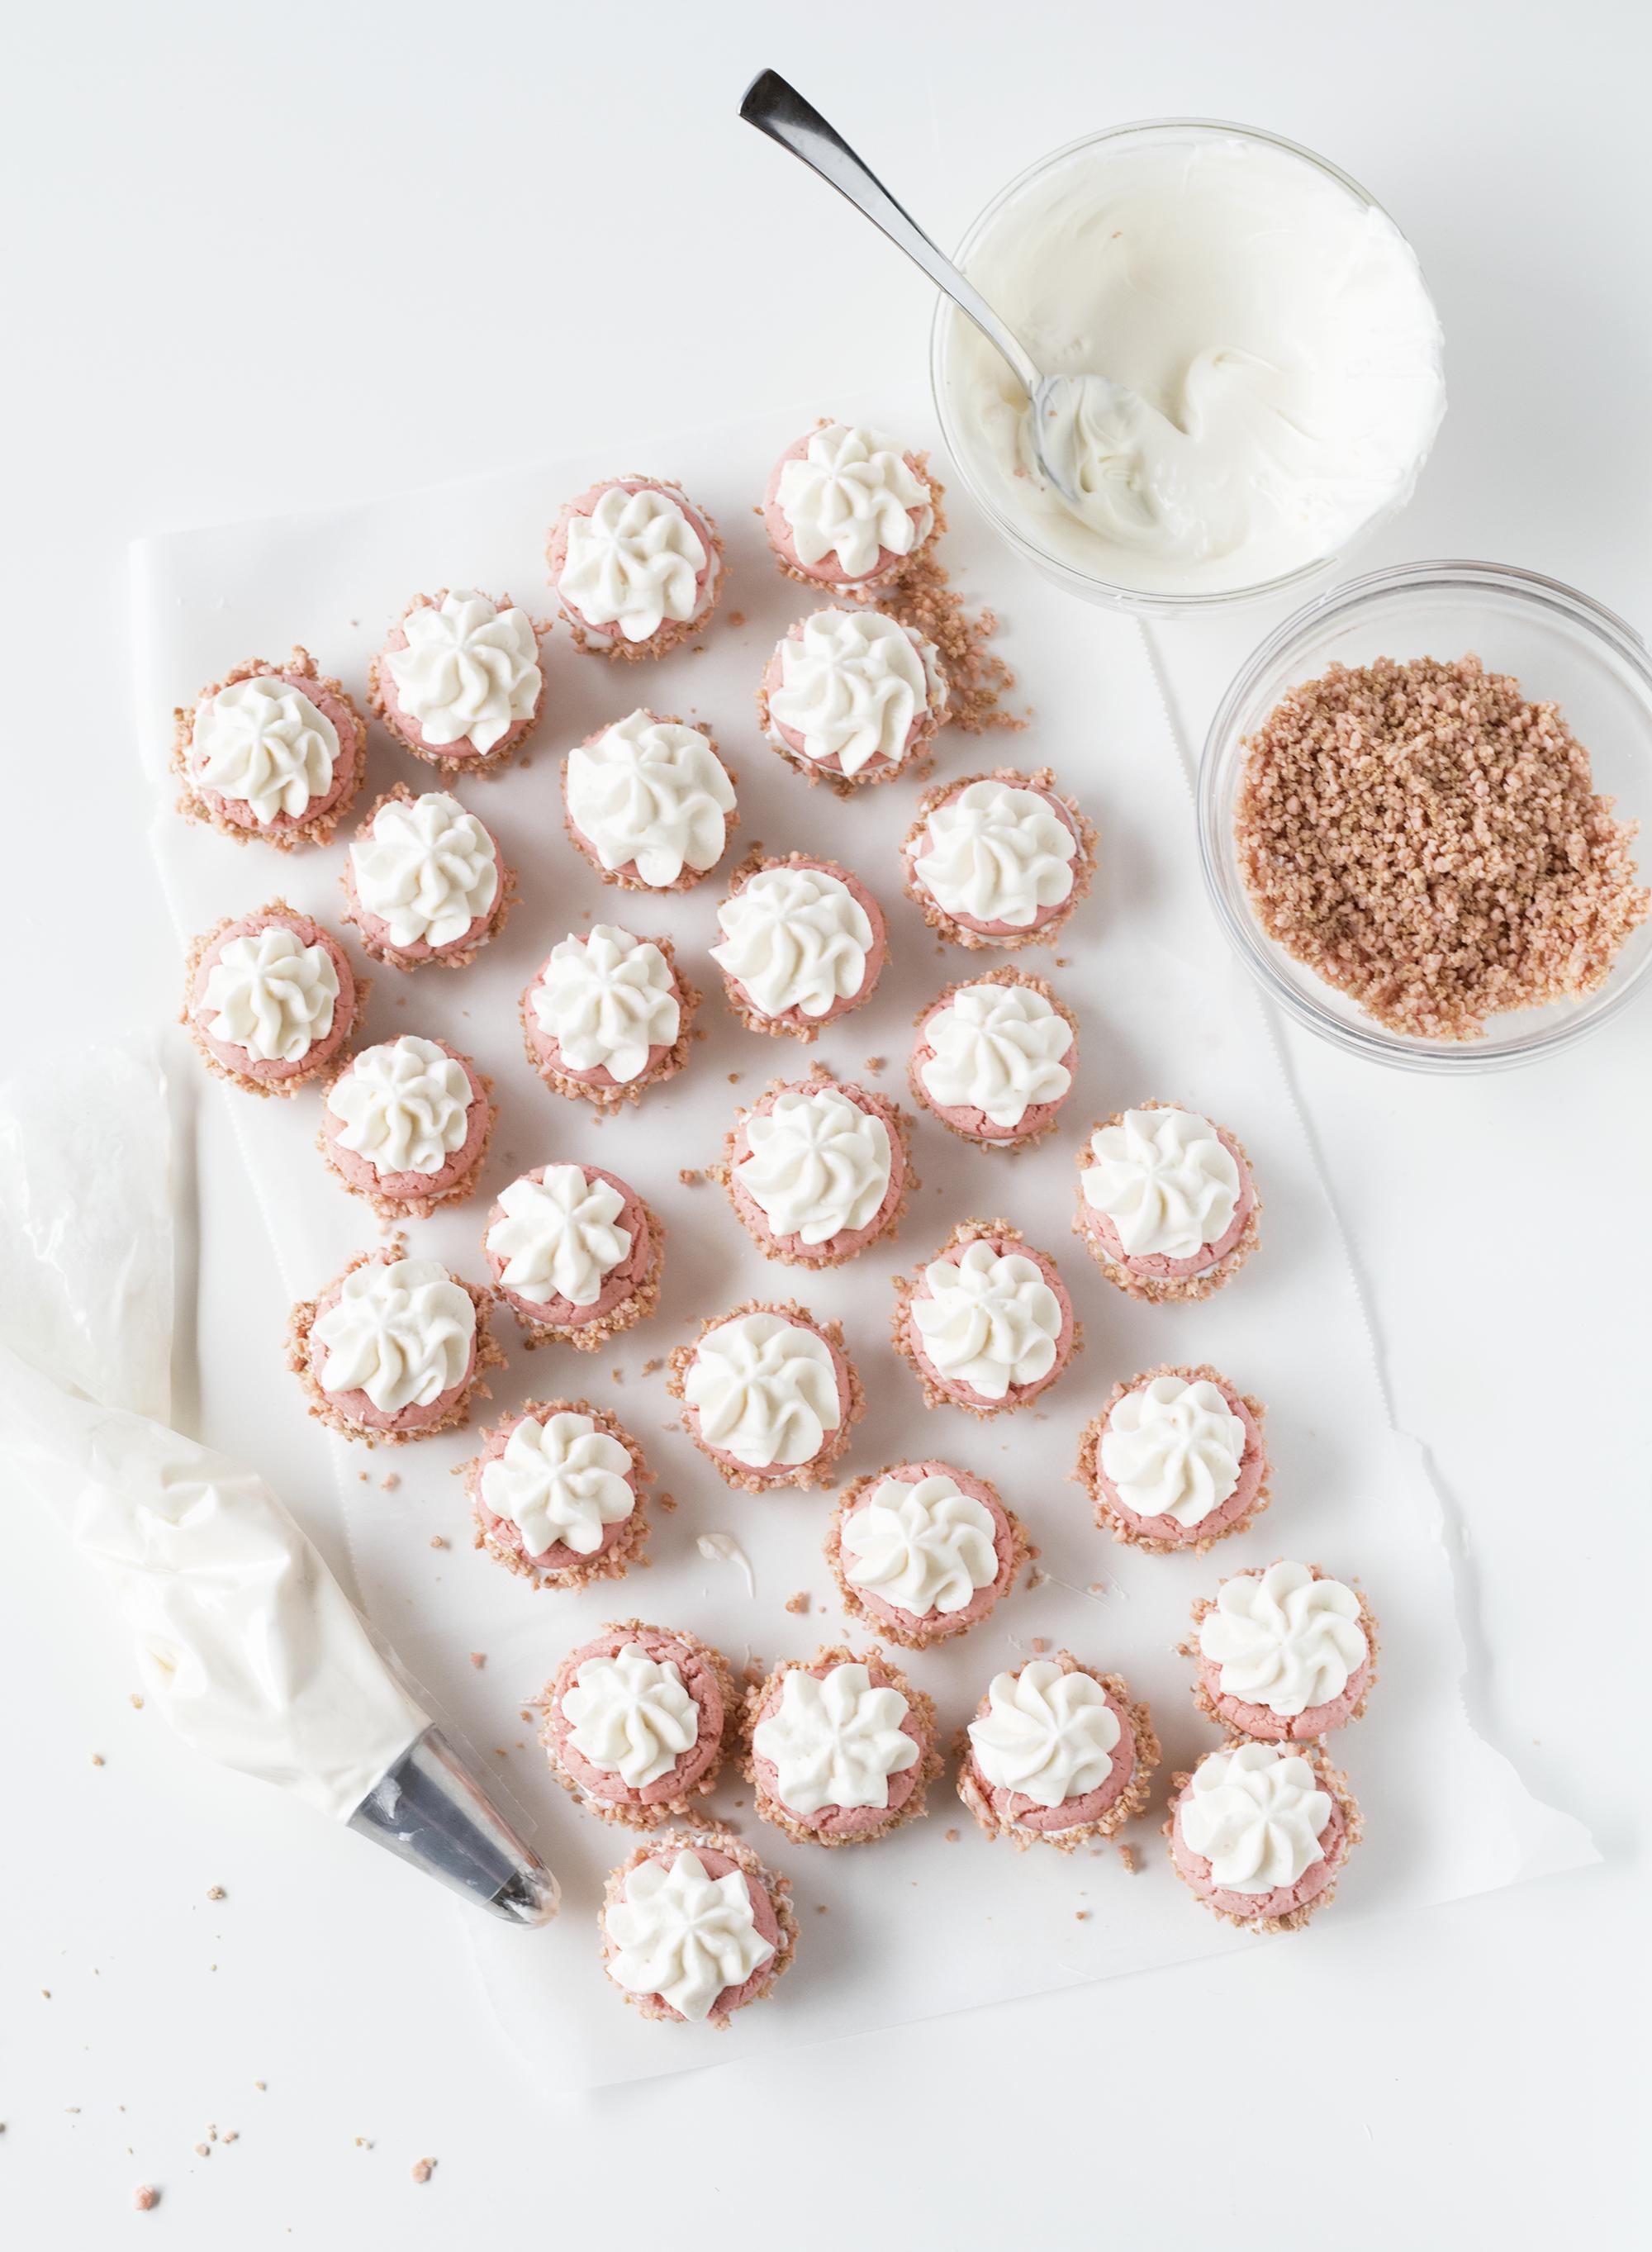 Strawberry Kit Kat Mini Cheesecake Cups | Sarah Makes Stuff